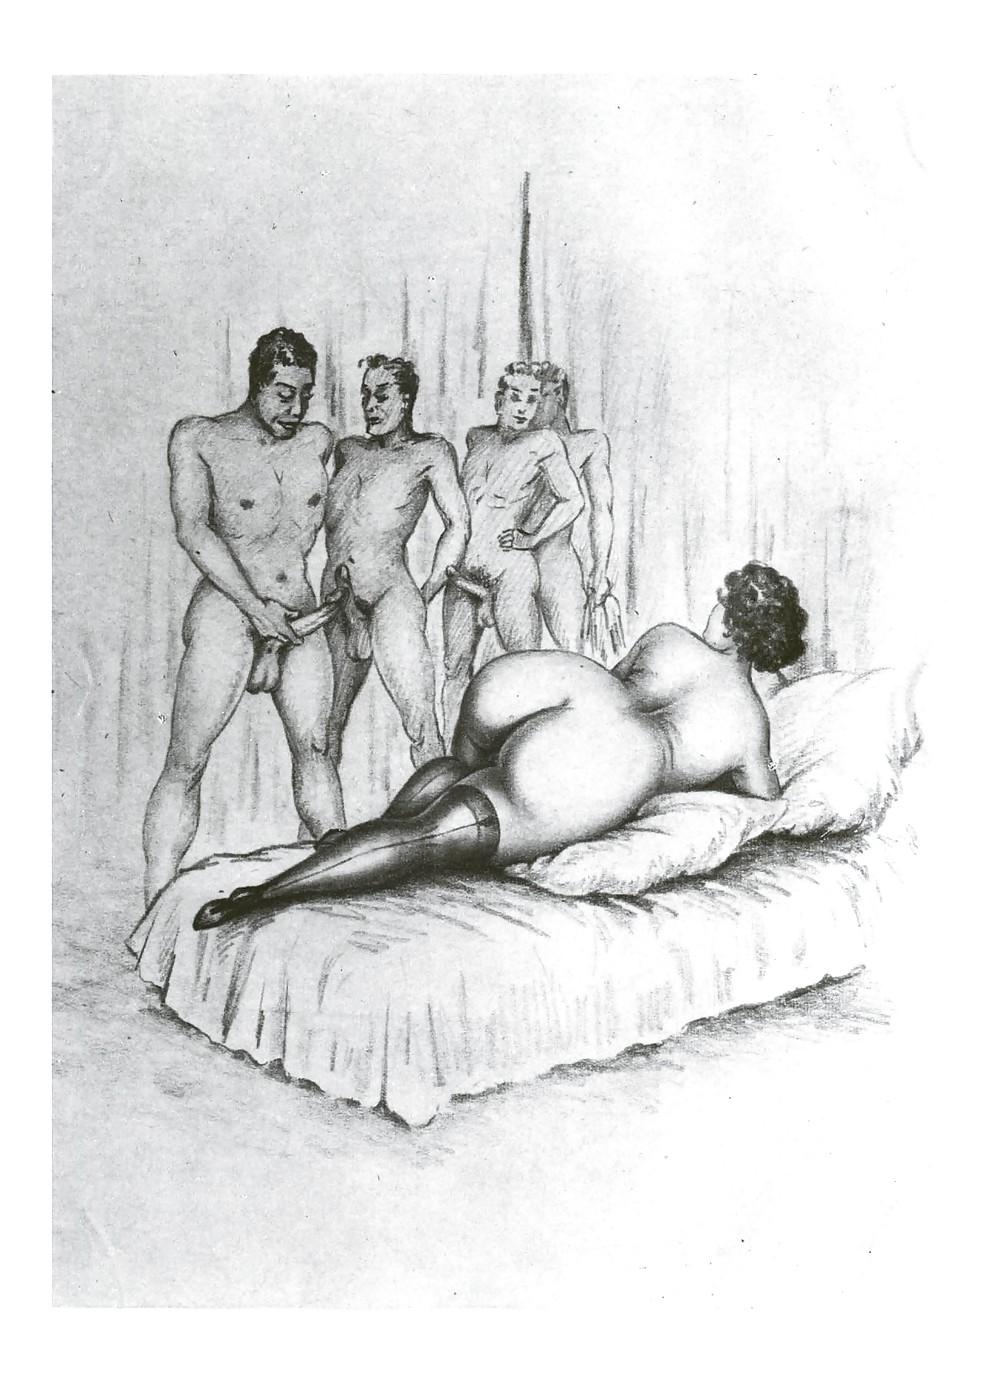 Erotic Vintage drawings Porn Pics #295618